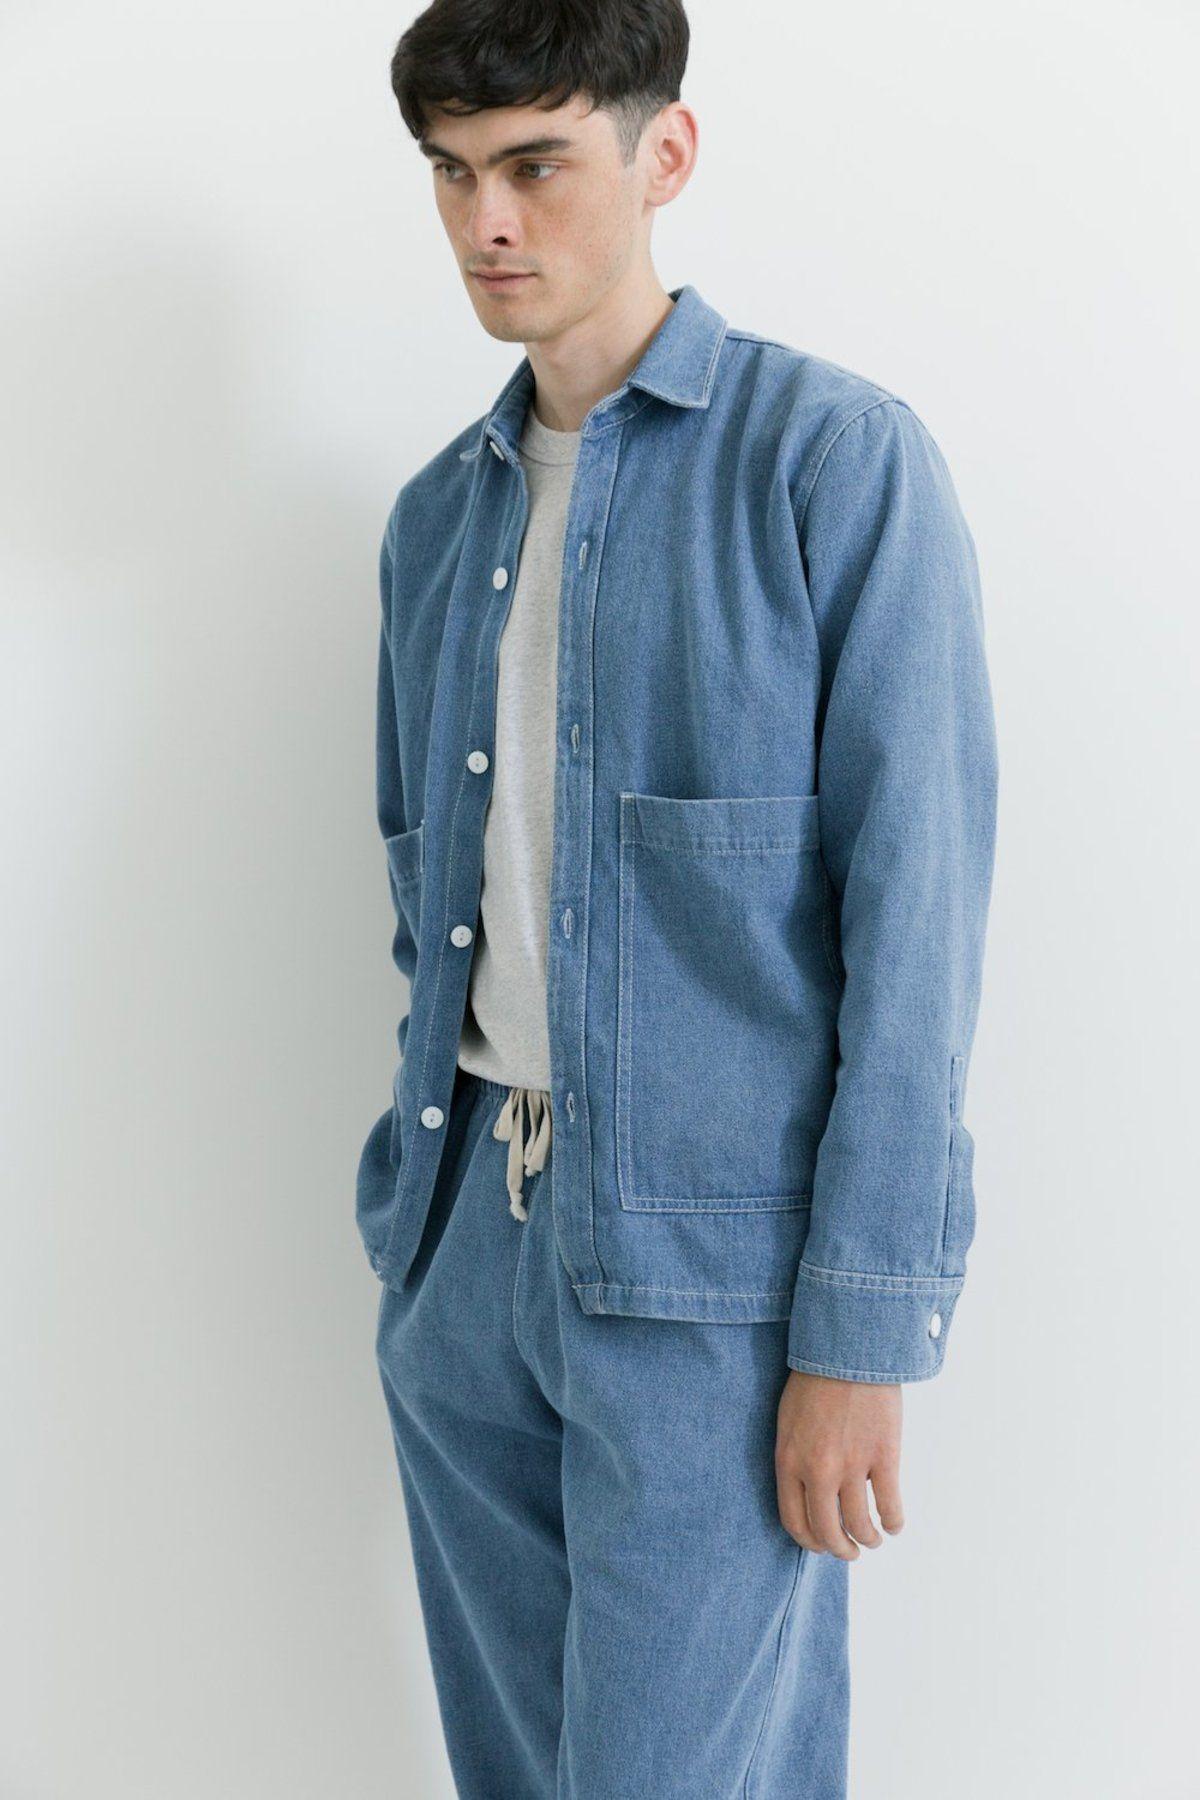 Unisex Ijji Work Jacket Denim On Garmentory Work Jackets Unisex Jacket Outerwear Jackets [ 1800 x 1200 Pixel ]